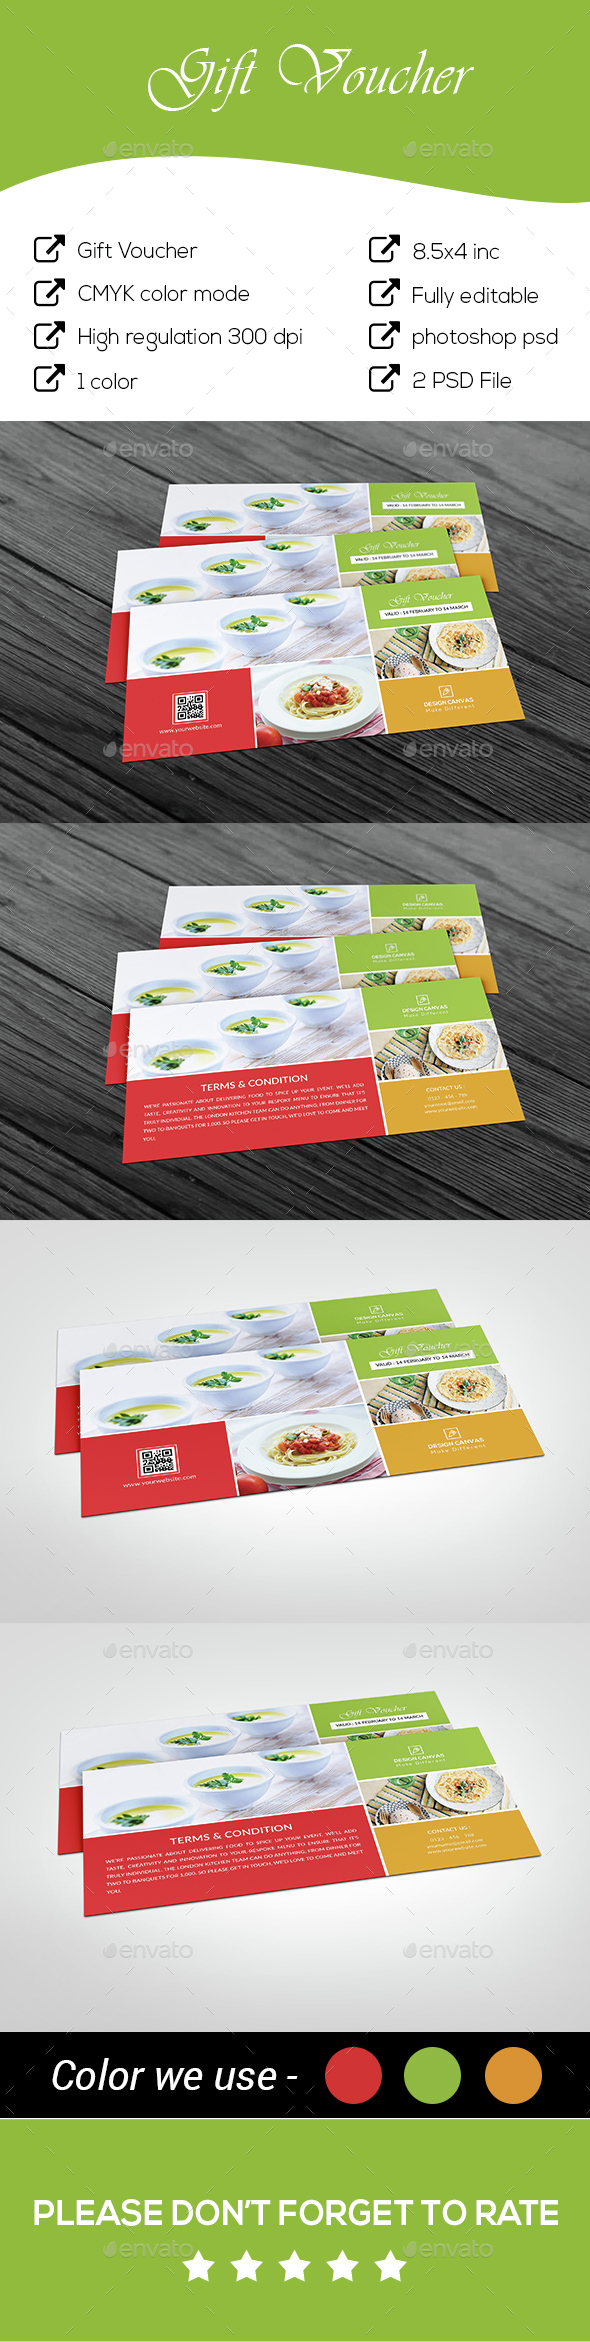 Restaurant Gift Voucher - Cards & Invites Print Templates